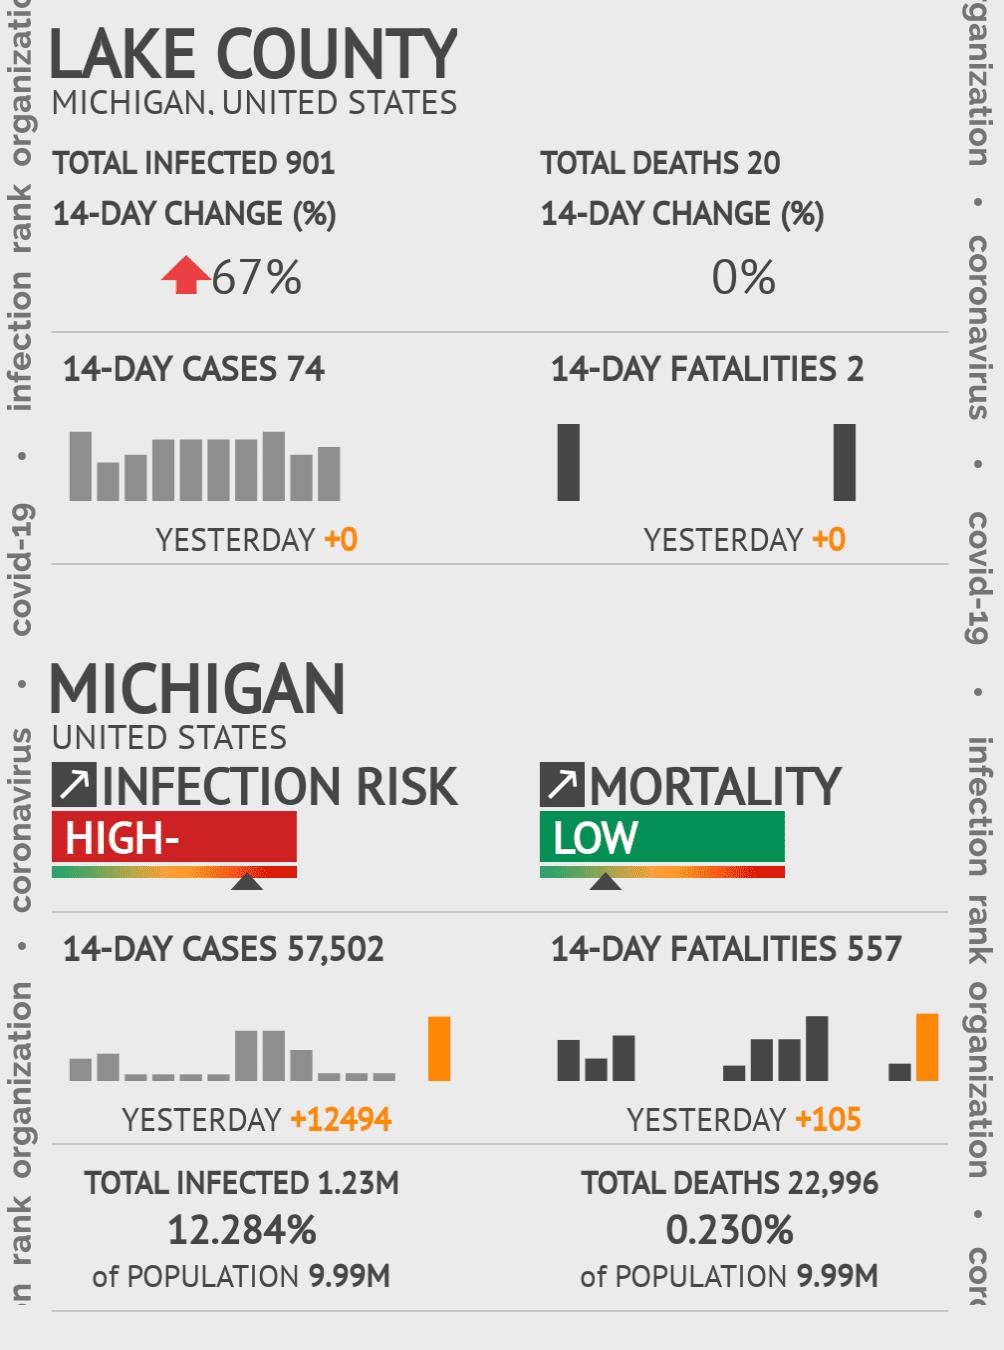 Lake County Coronavirus Covid-19 Risk of Infection on February 25, 2021